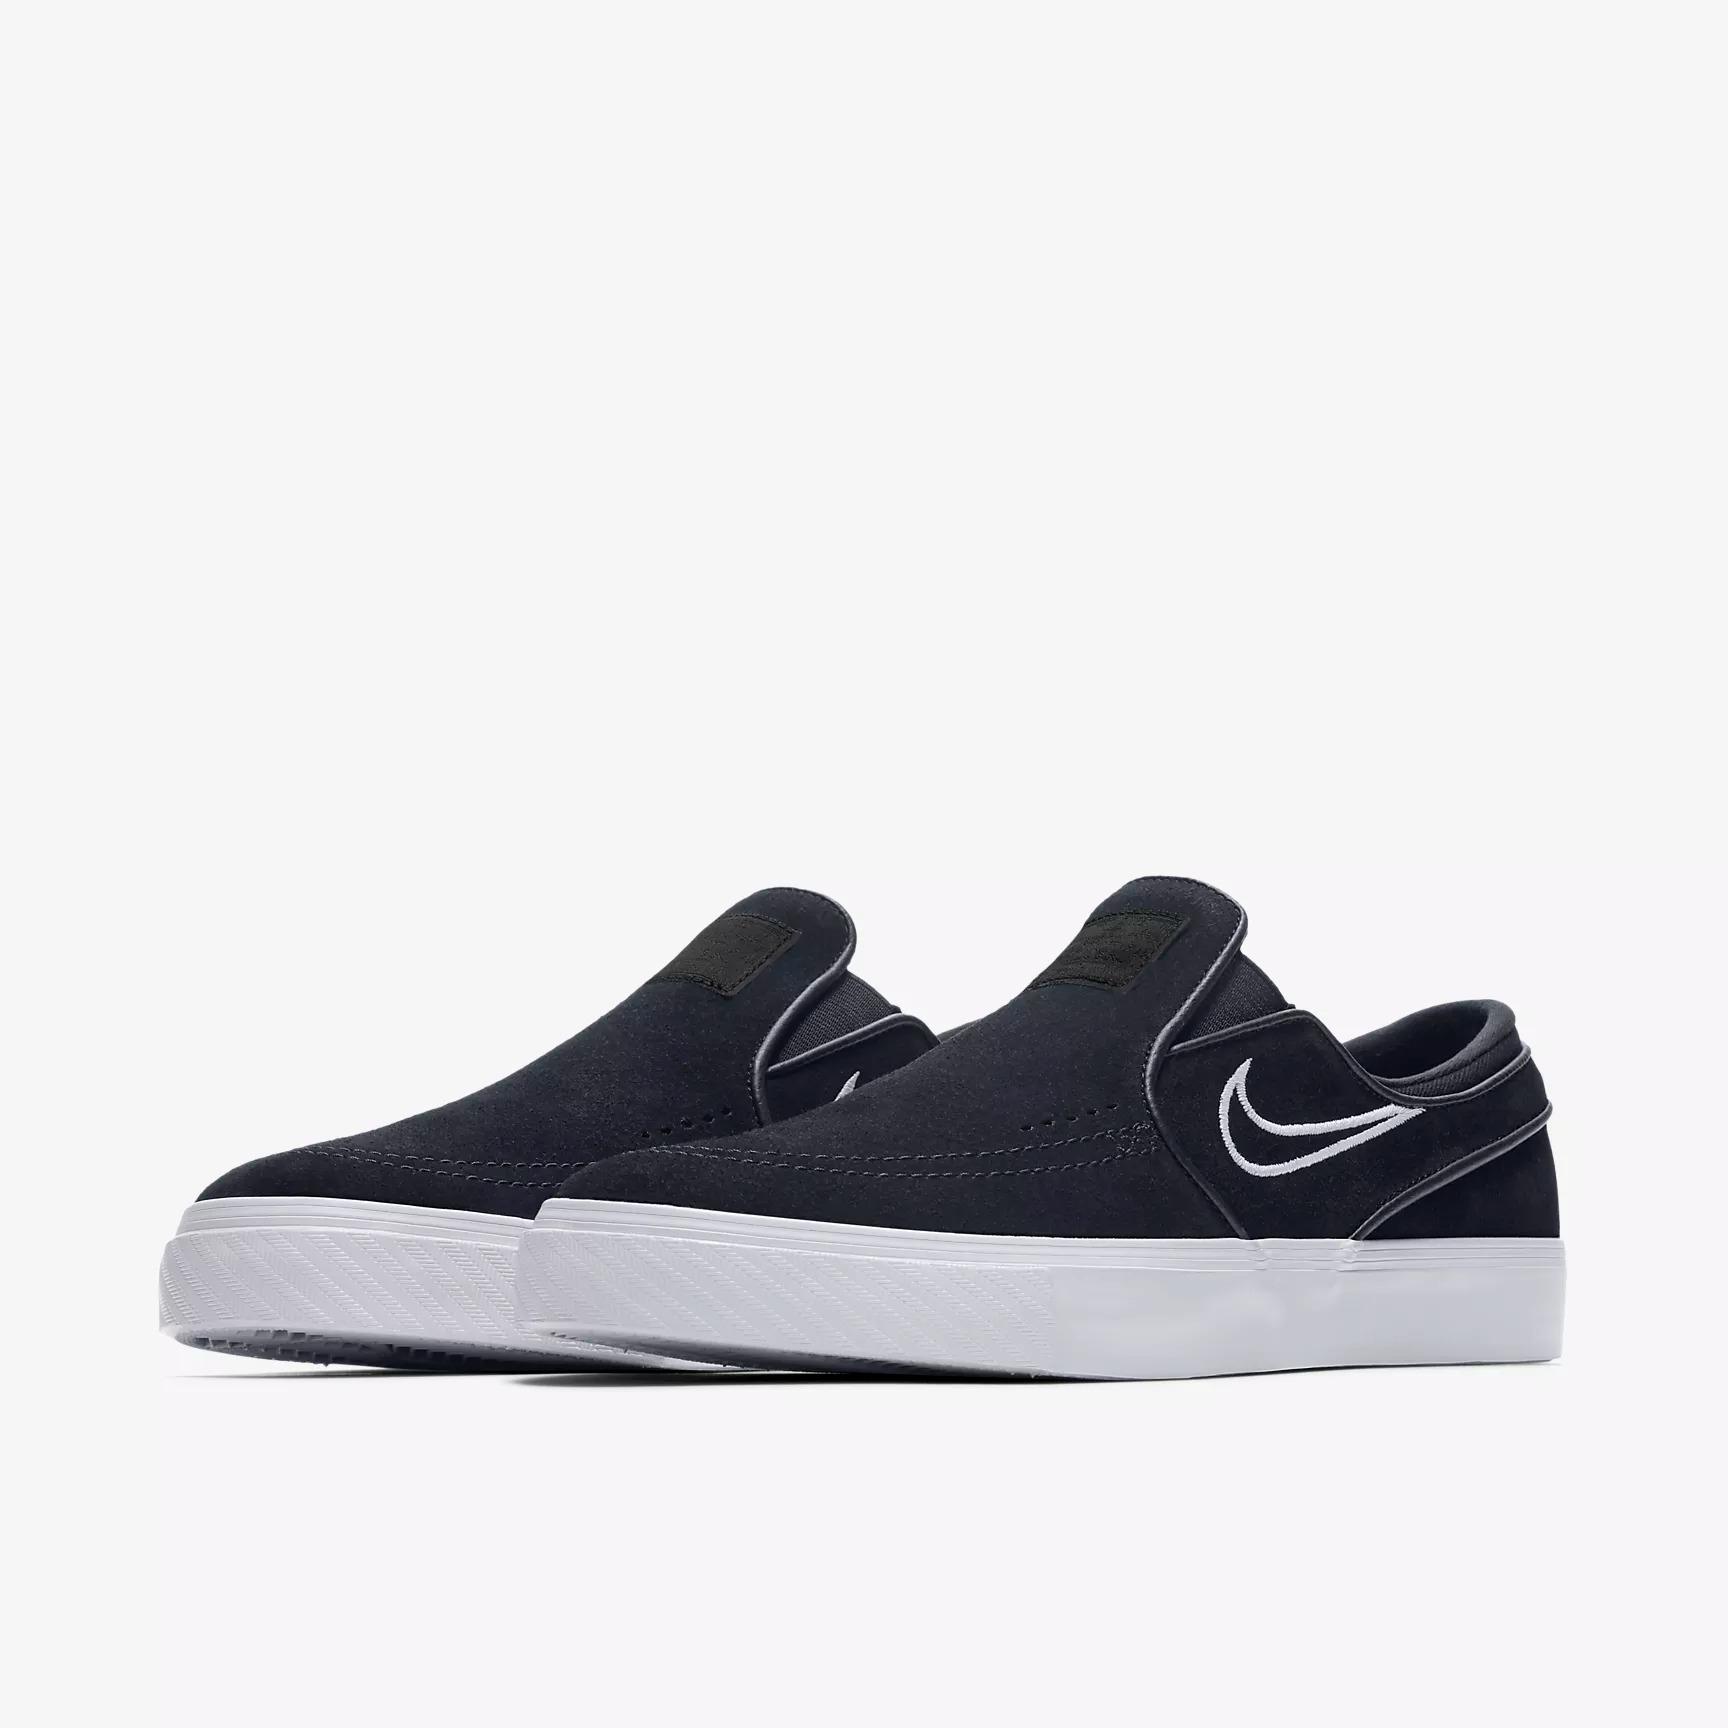 20465ac4af66 Nike SB Zoom Stefan Janoski Slip Sneakers - SPORT SHOES Lifestyle Shoes